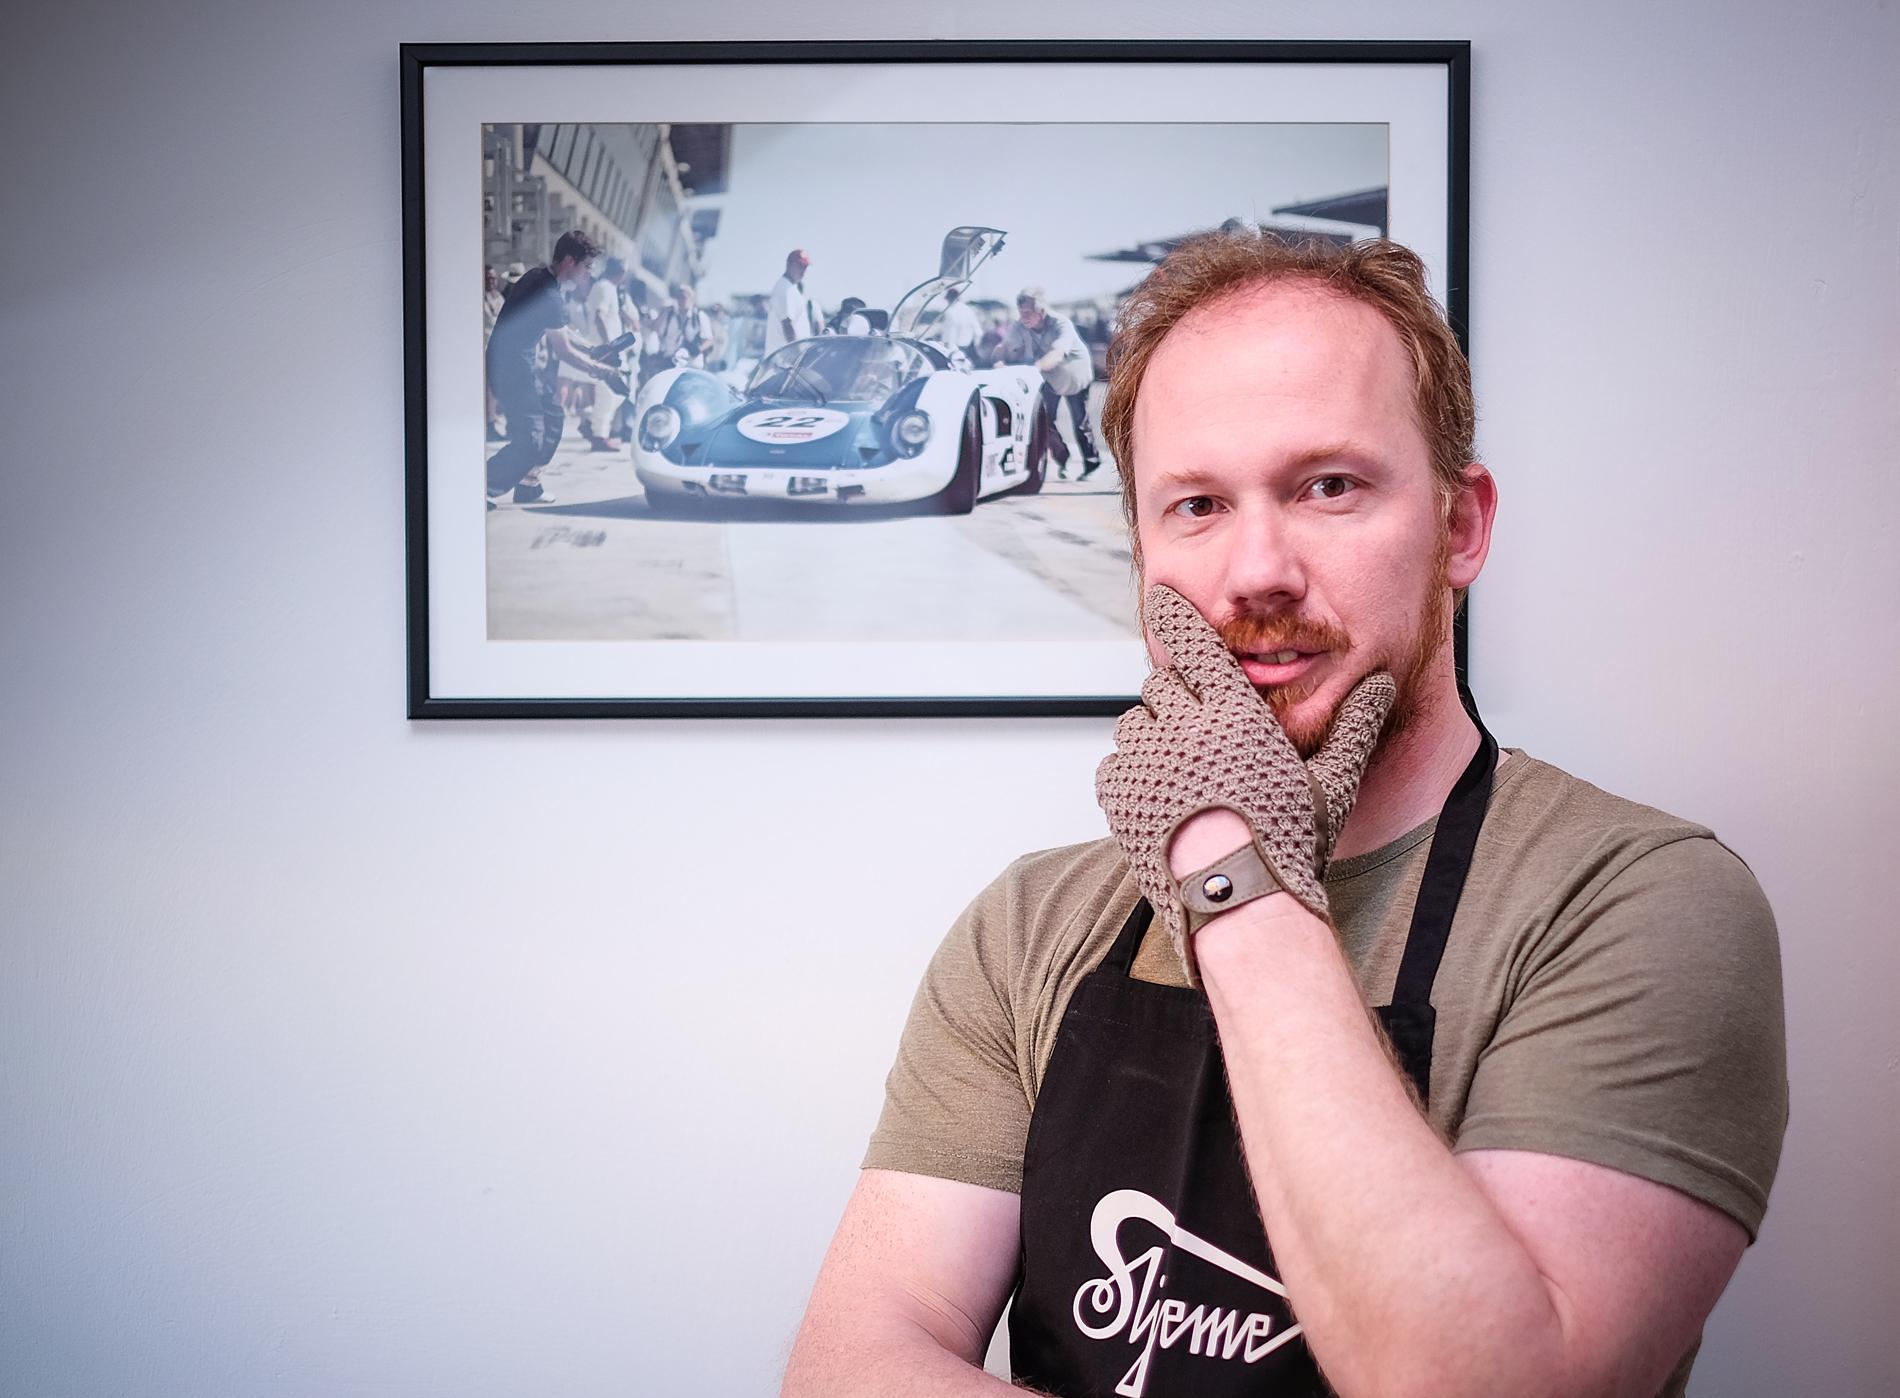 Daniel Tomičić glavom, bradom i Majstorovom rukavicom ;)